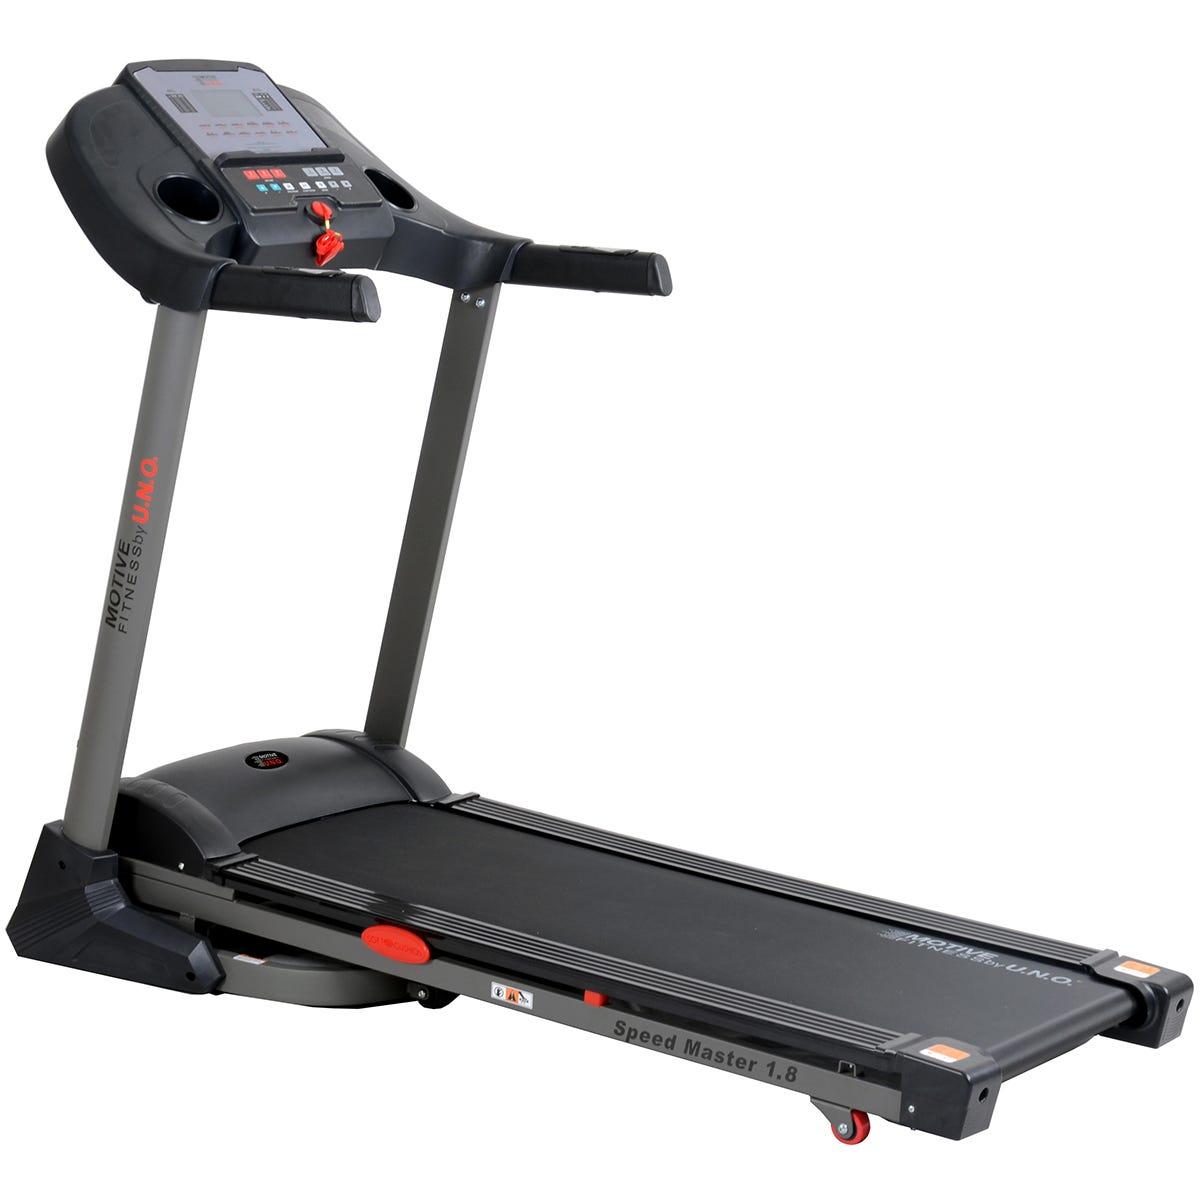 Motive Fitness MOTIVEfitness by UNO Speedmaster 1.8 Programmable Power Incline Treadmill - Black